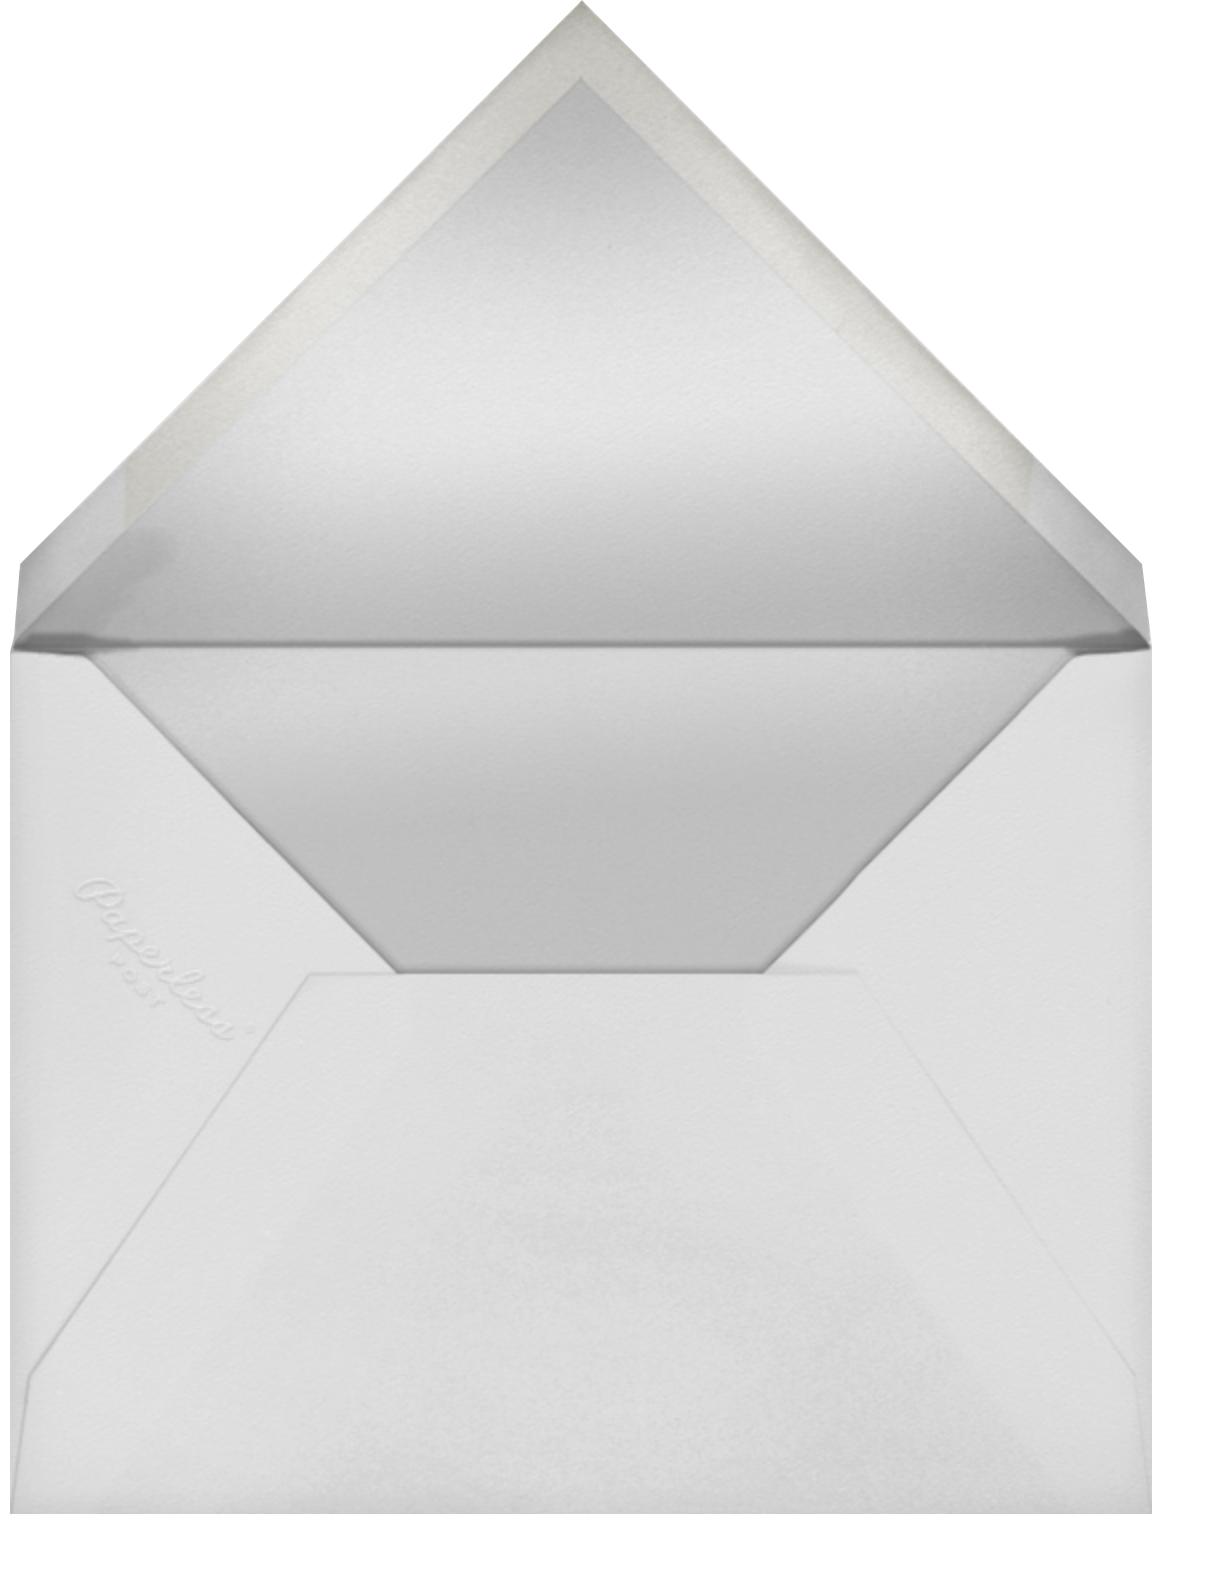 Dvaar (Menu) - White - Paperless Post - Menus - envelope back